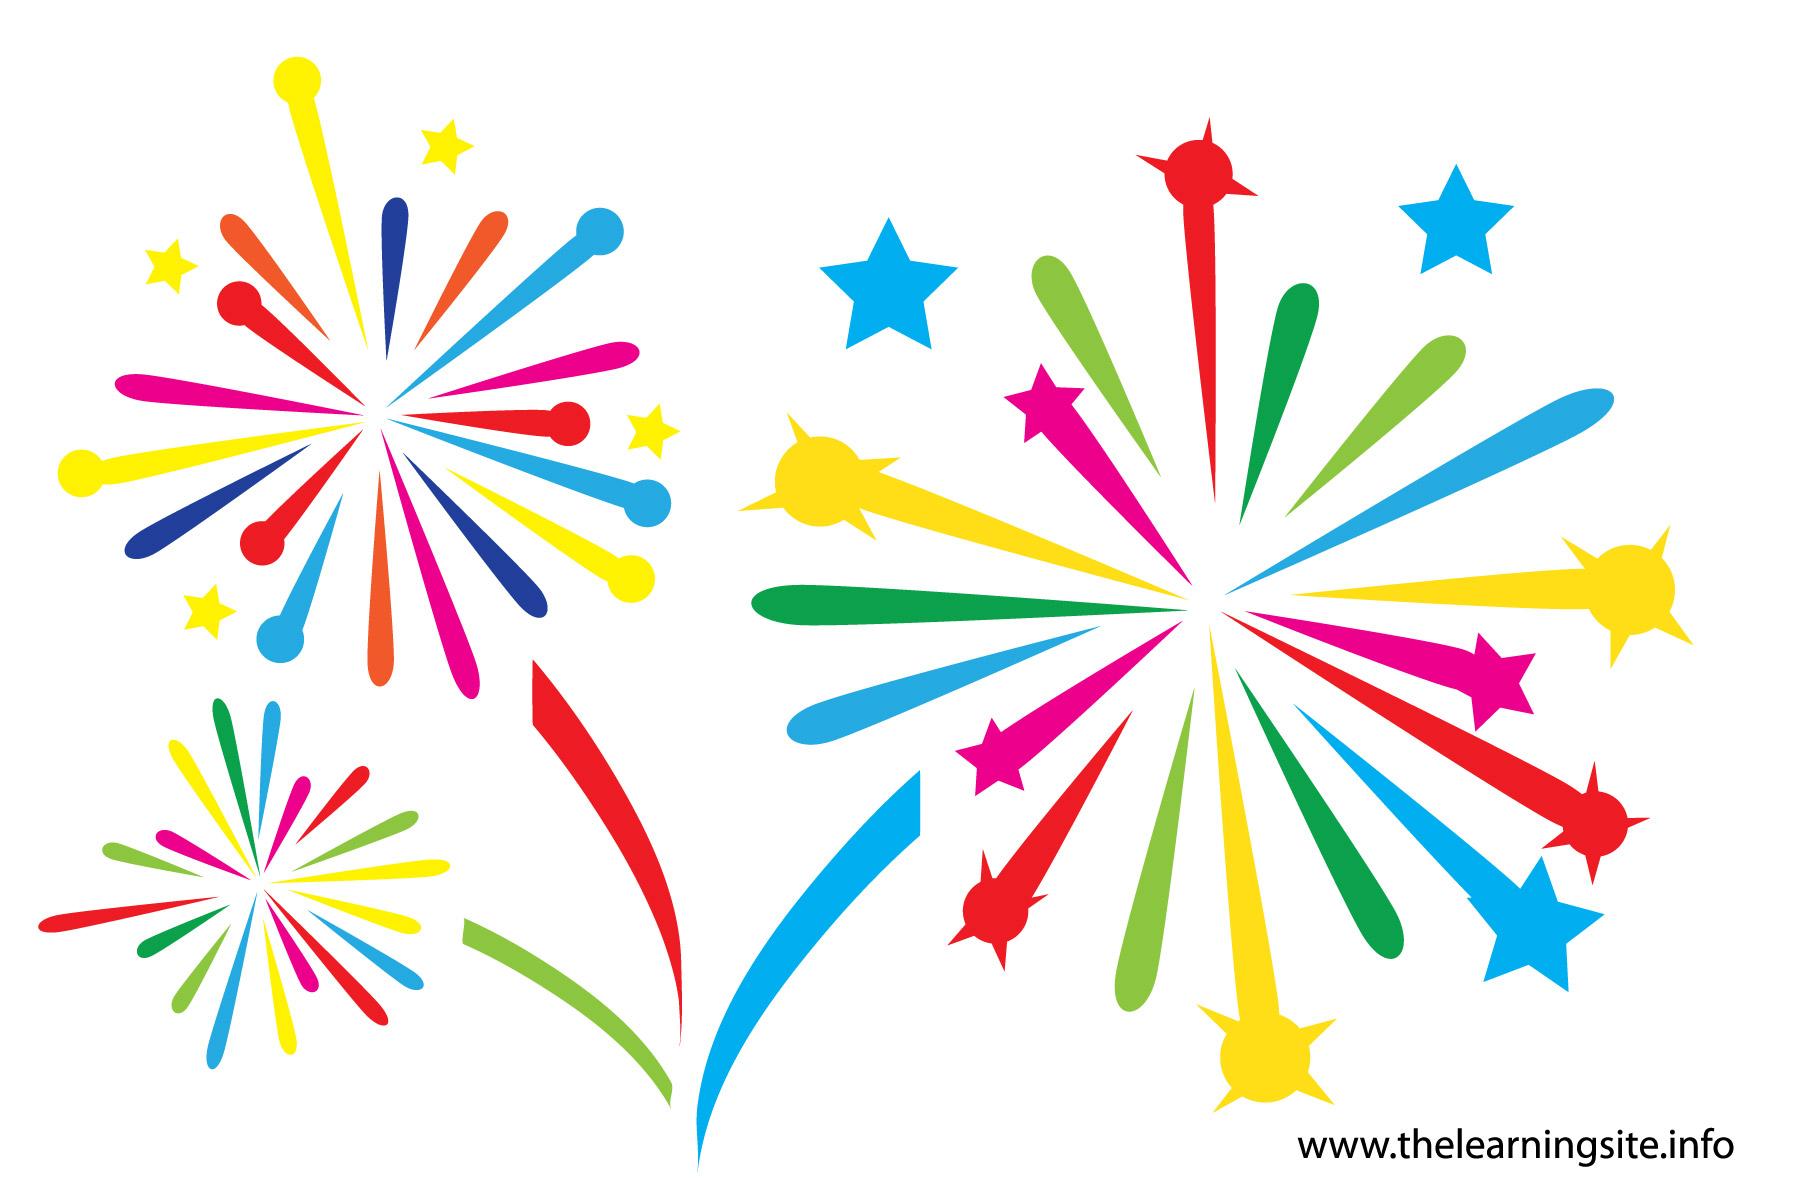 Clip art fireworks clipartfox 2-Clip art fireworks clipartfox 2-5